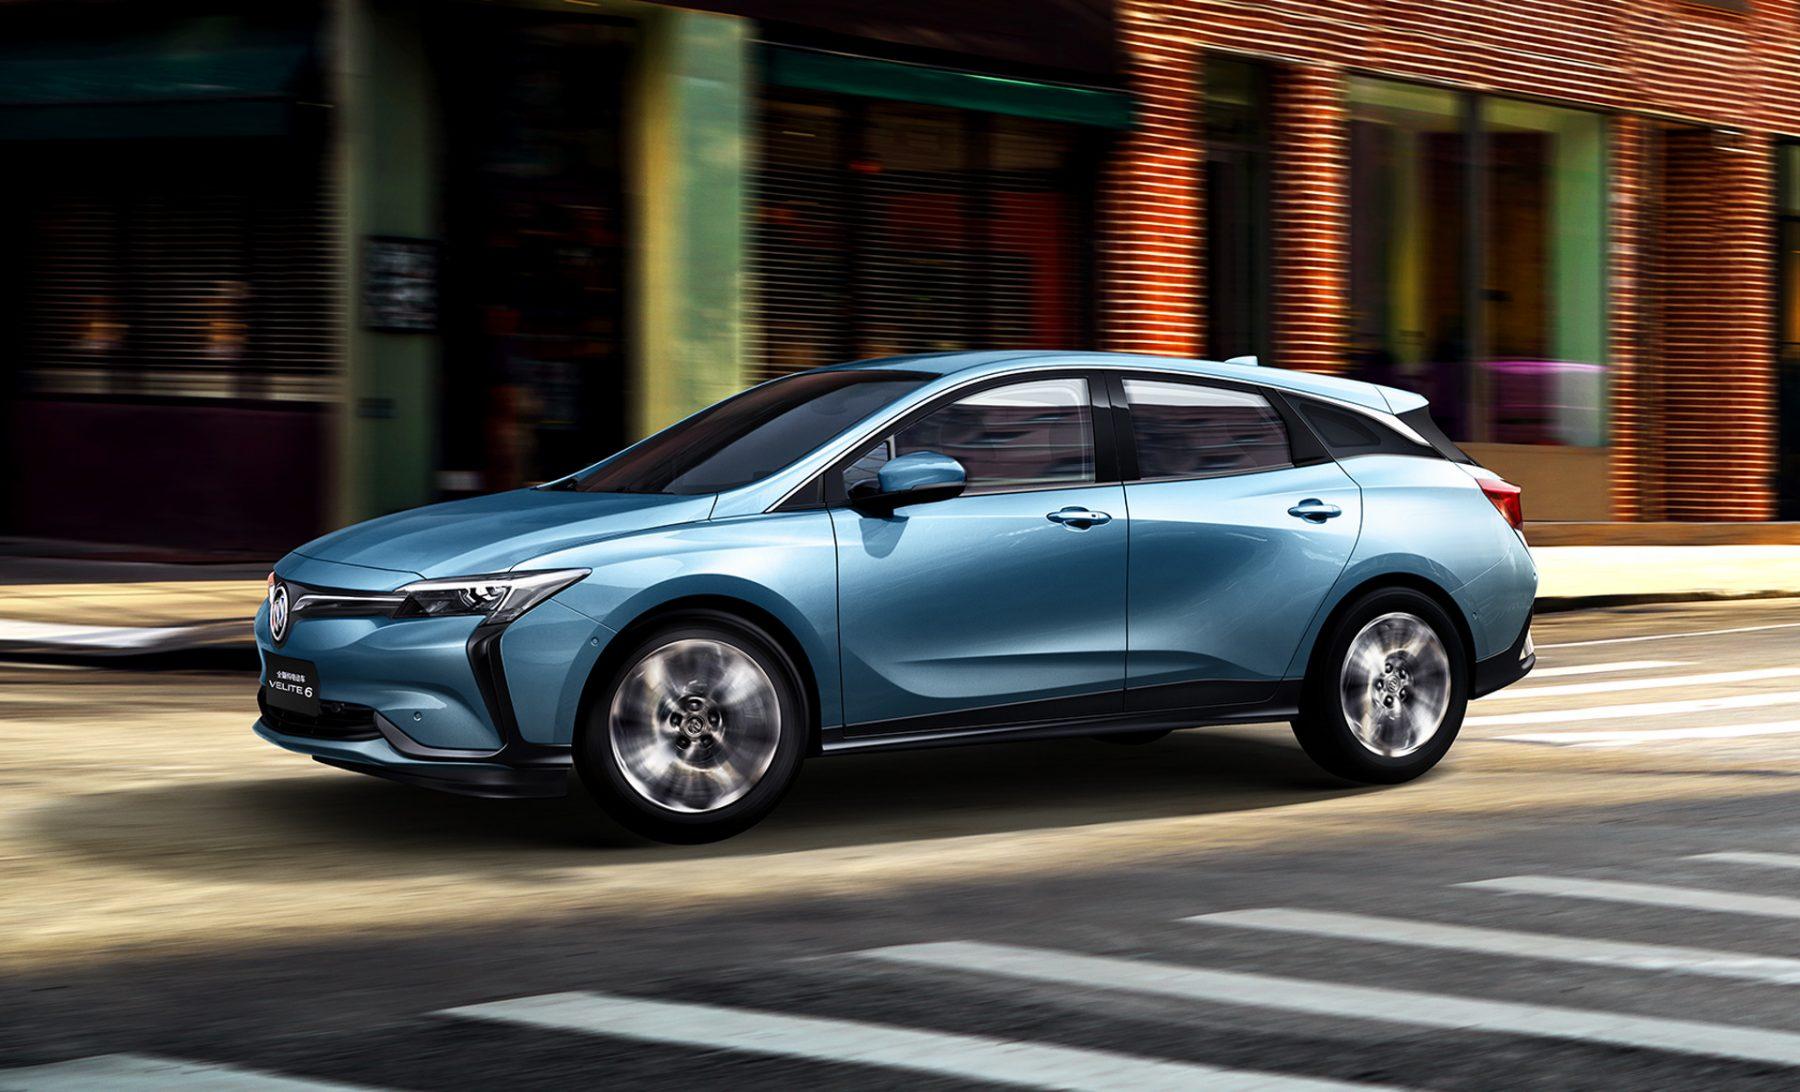 Chevrolet Menlo Ev Revealed Possible Bolt Euv Evbite